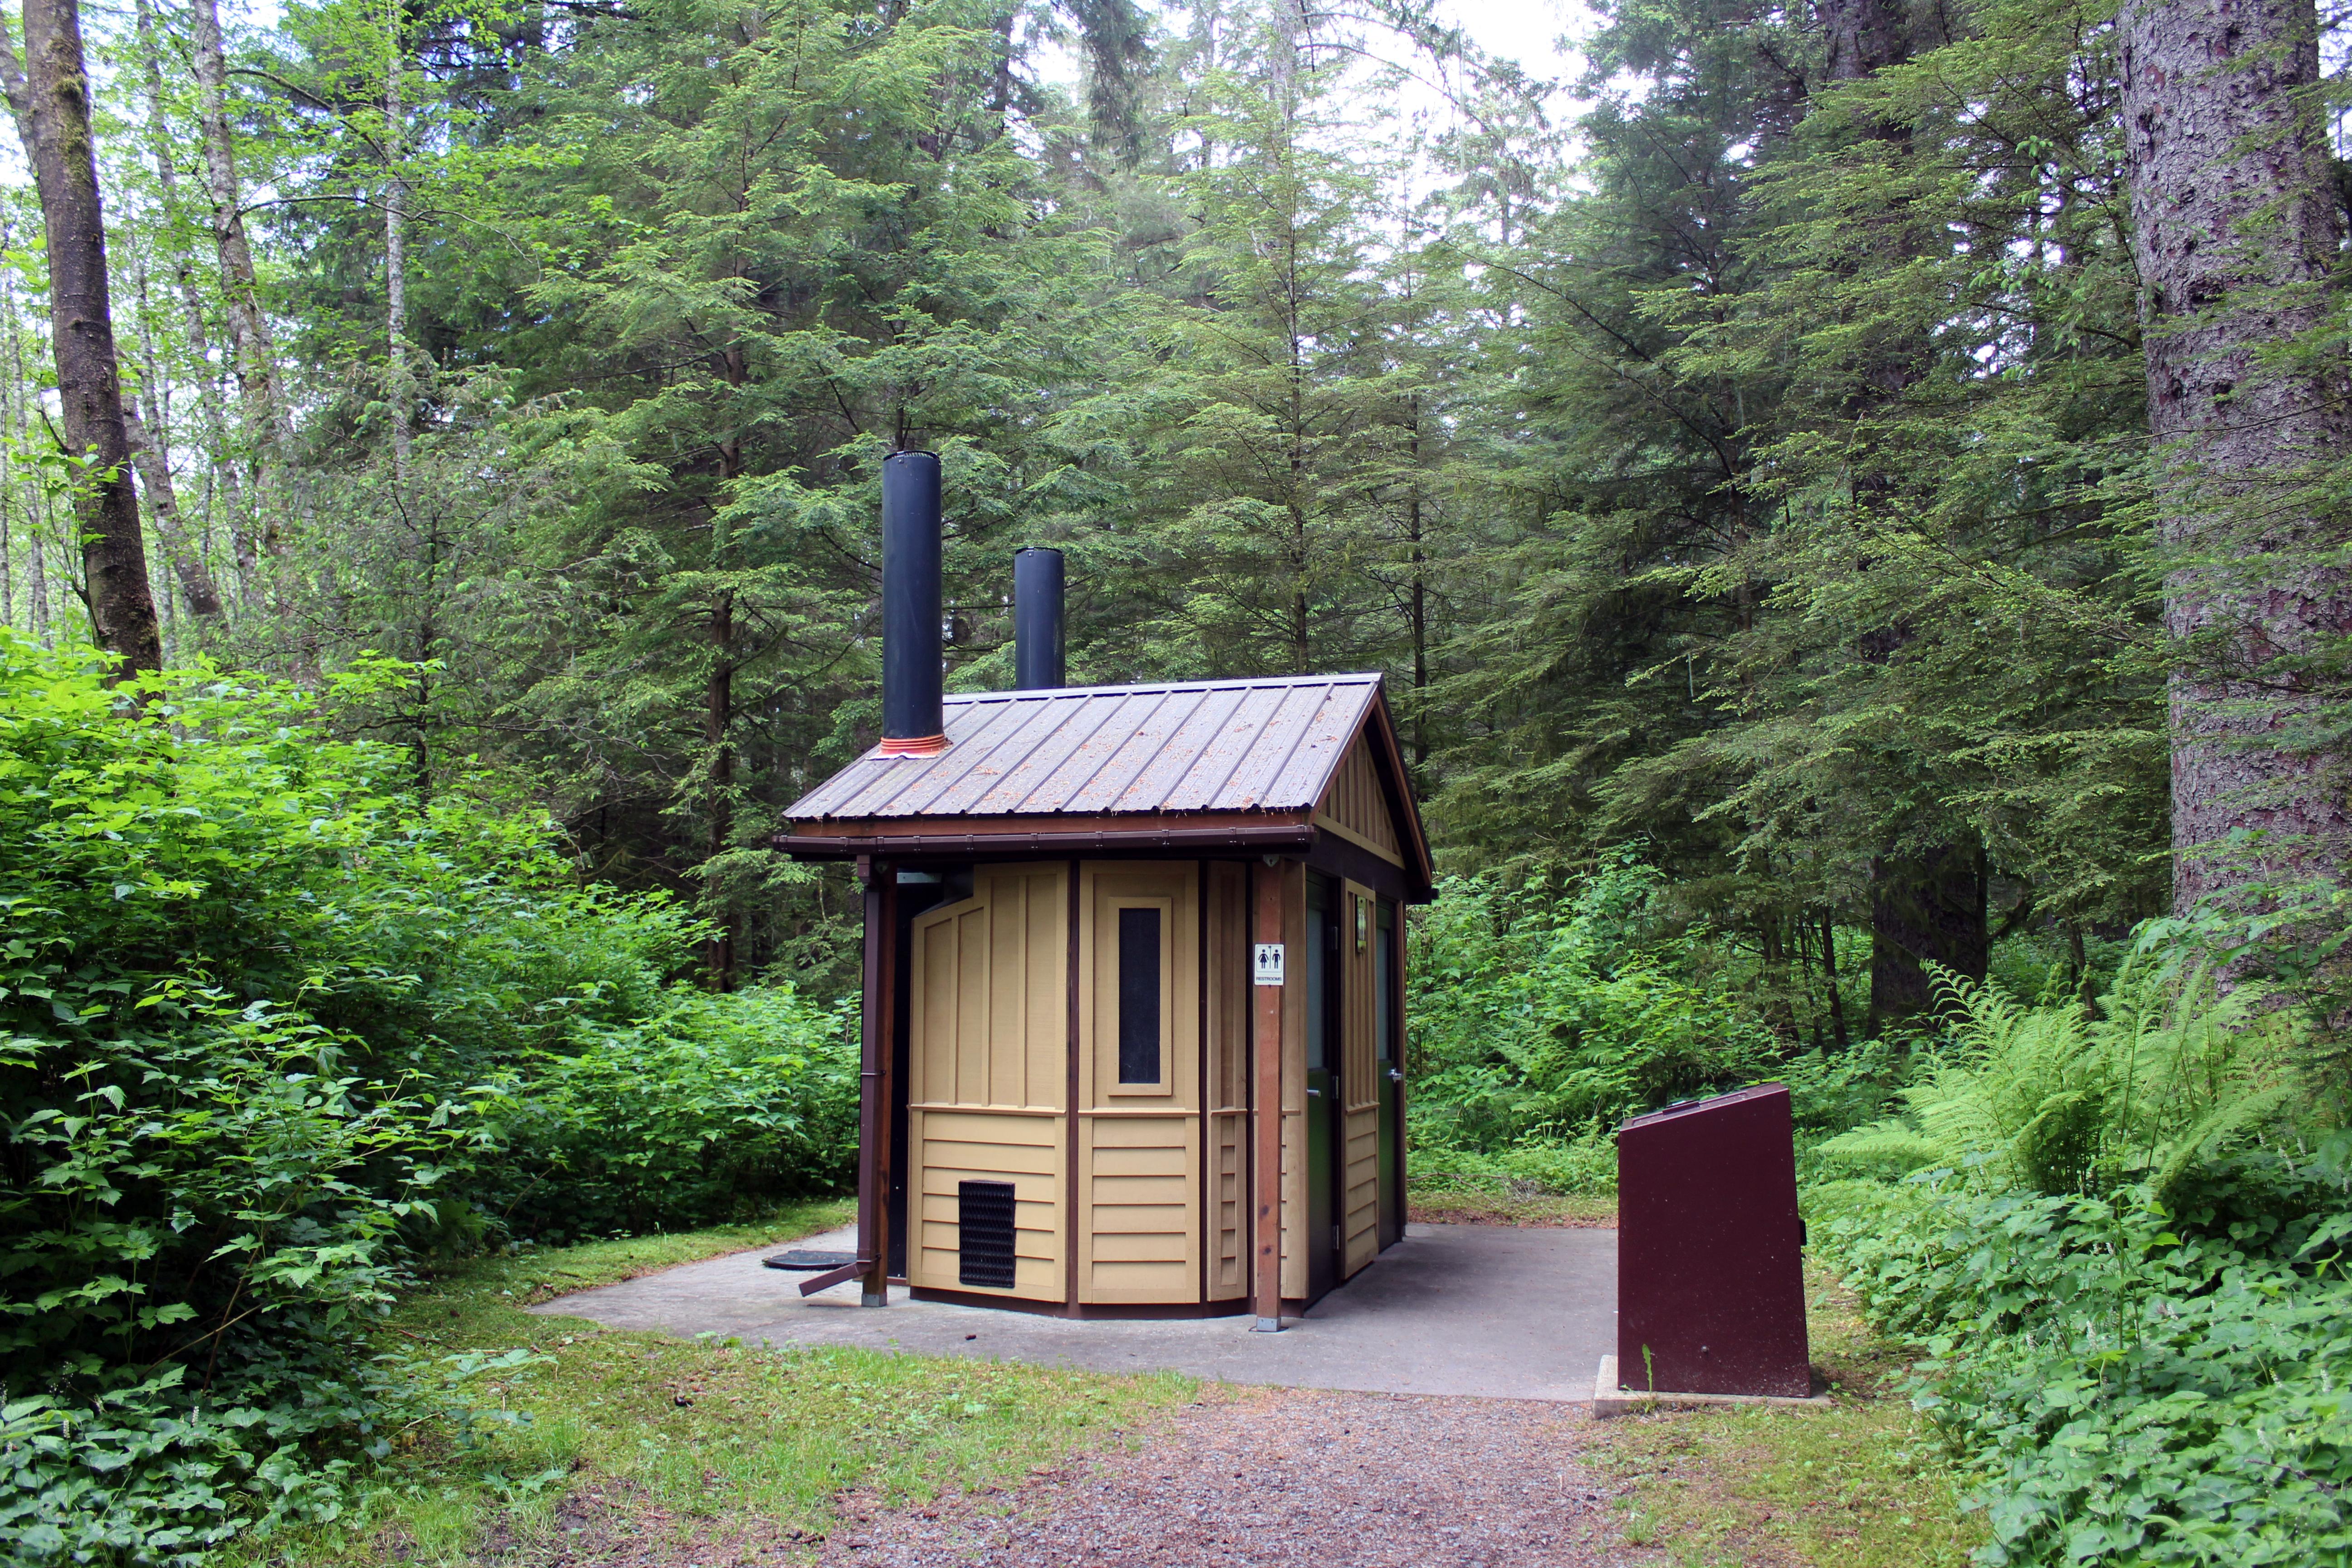 tiny house in the woods, Sitka, Alaska  Waikanae Watch